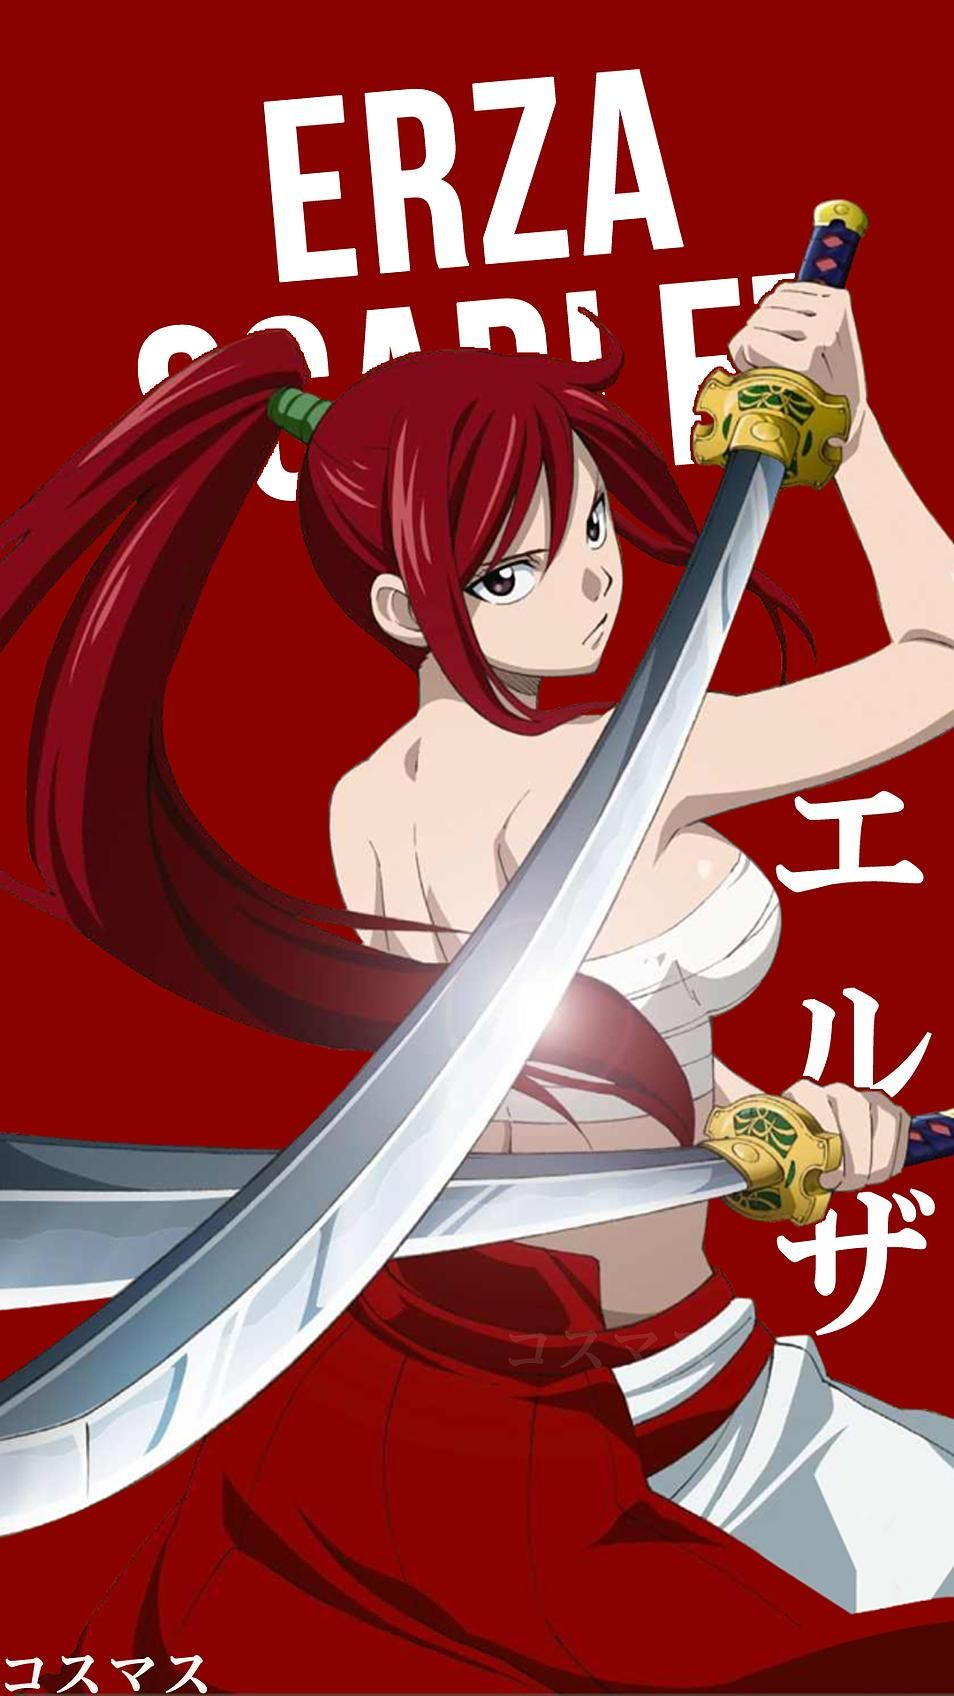 Erza Scarlet Korigengi Wallpaper Anime Personajes de